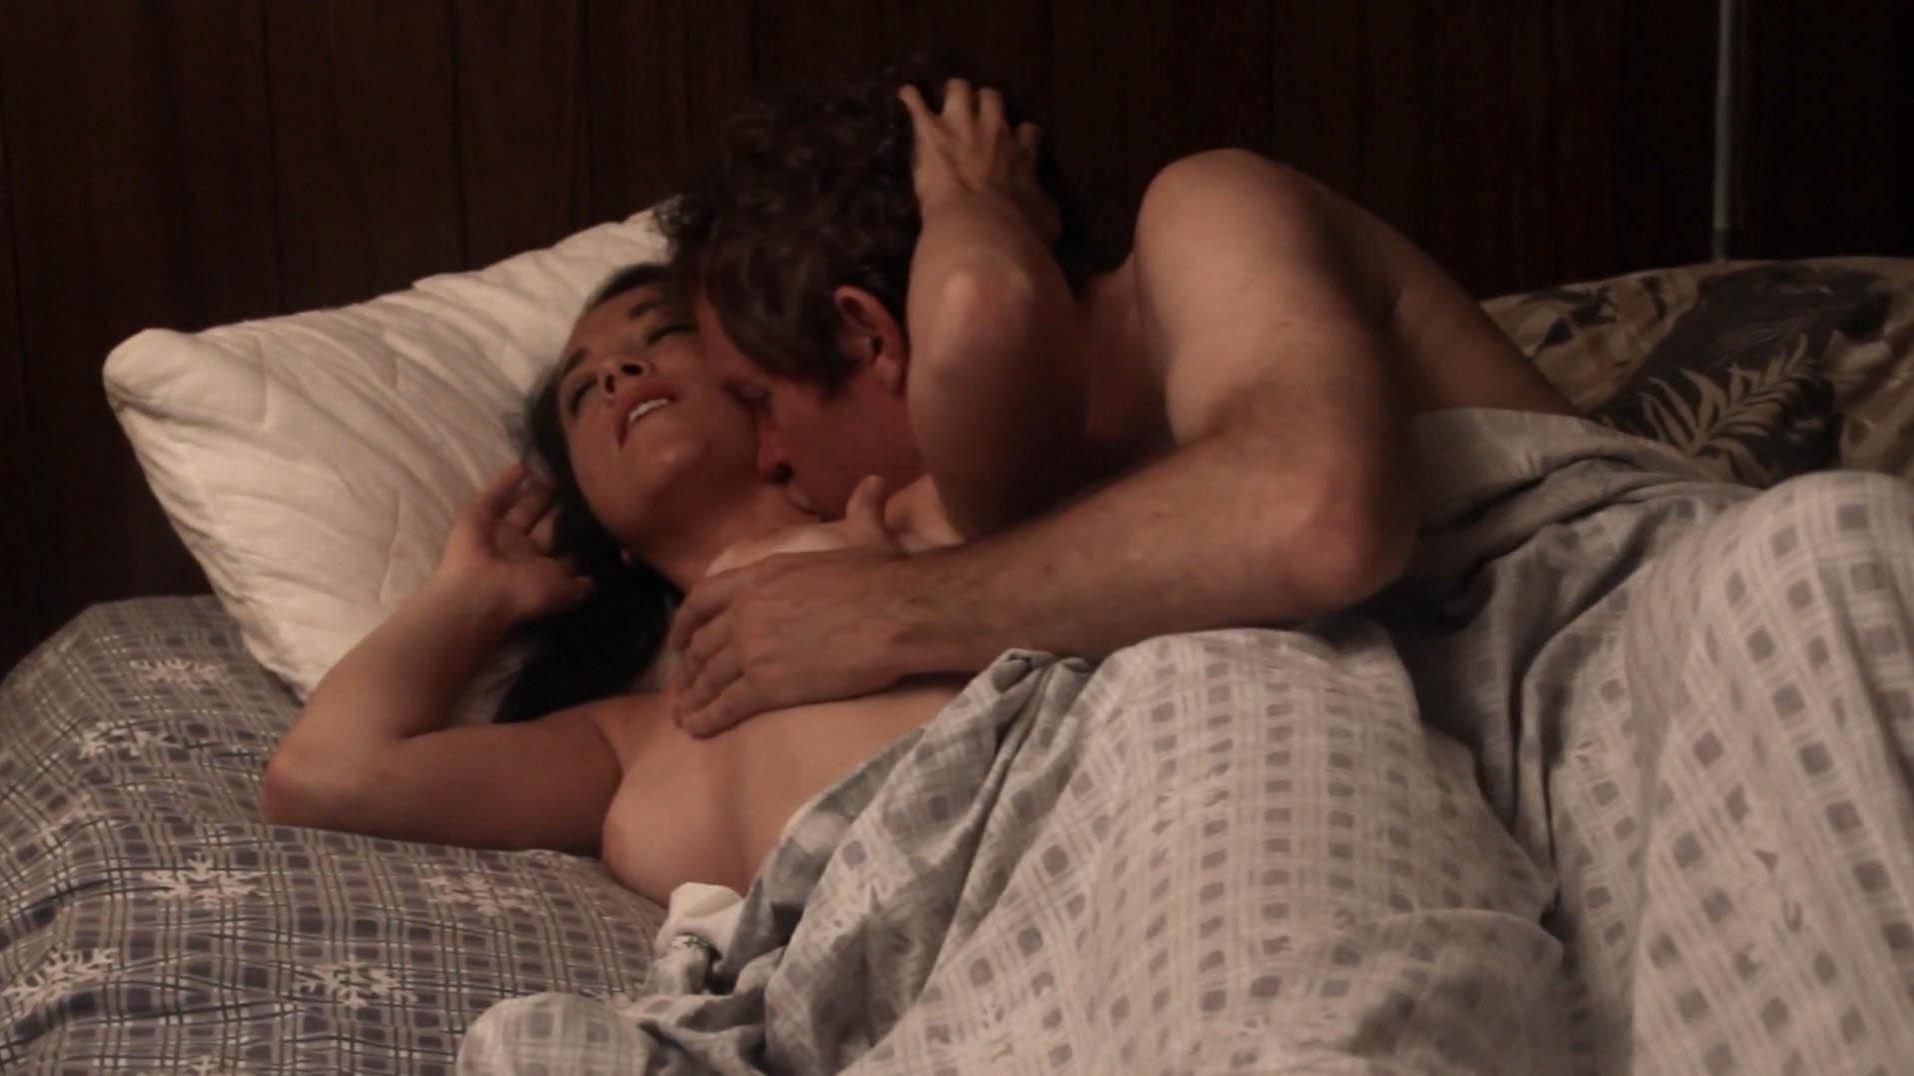 Rachel Alig nude - At Granny's House (2015)